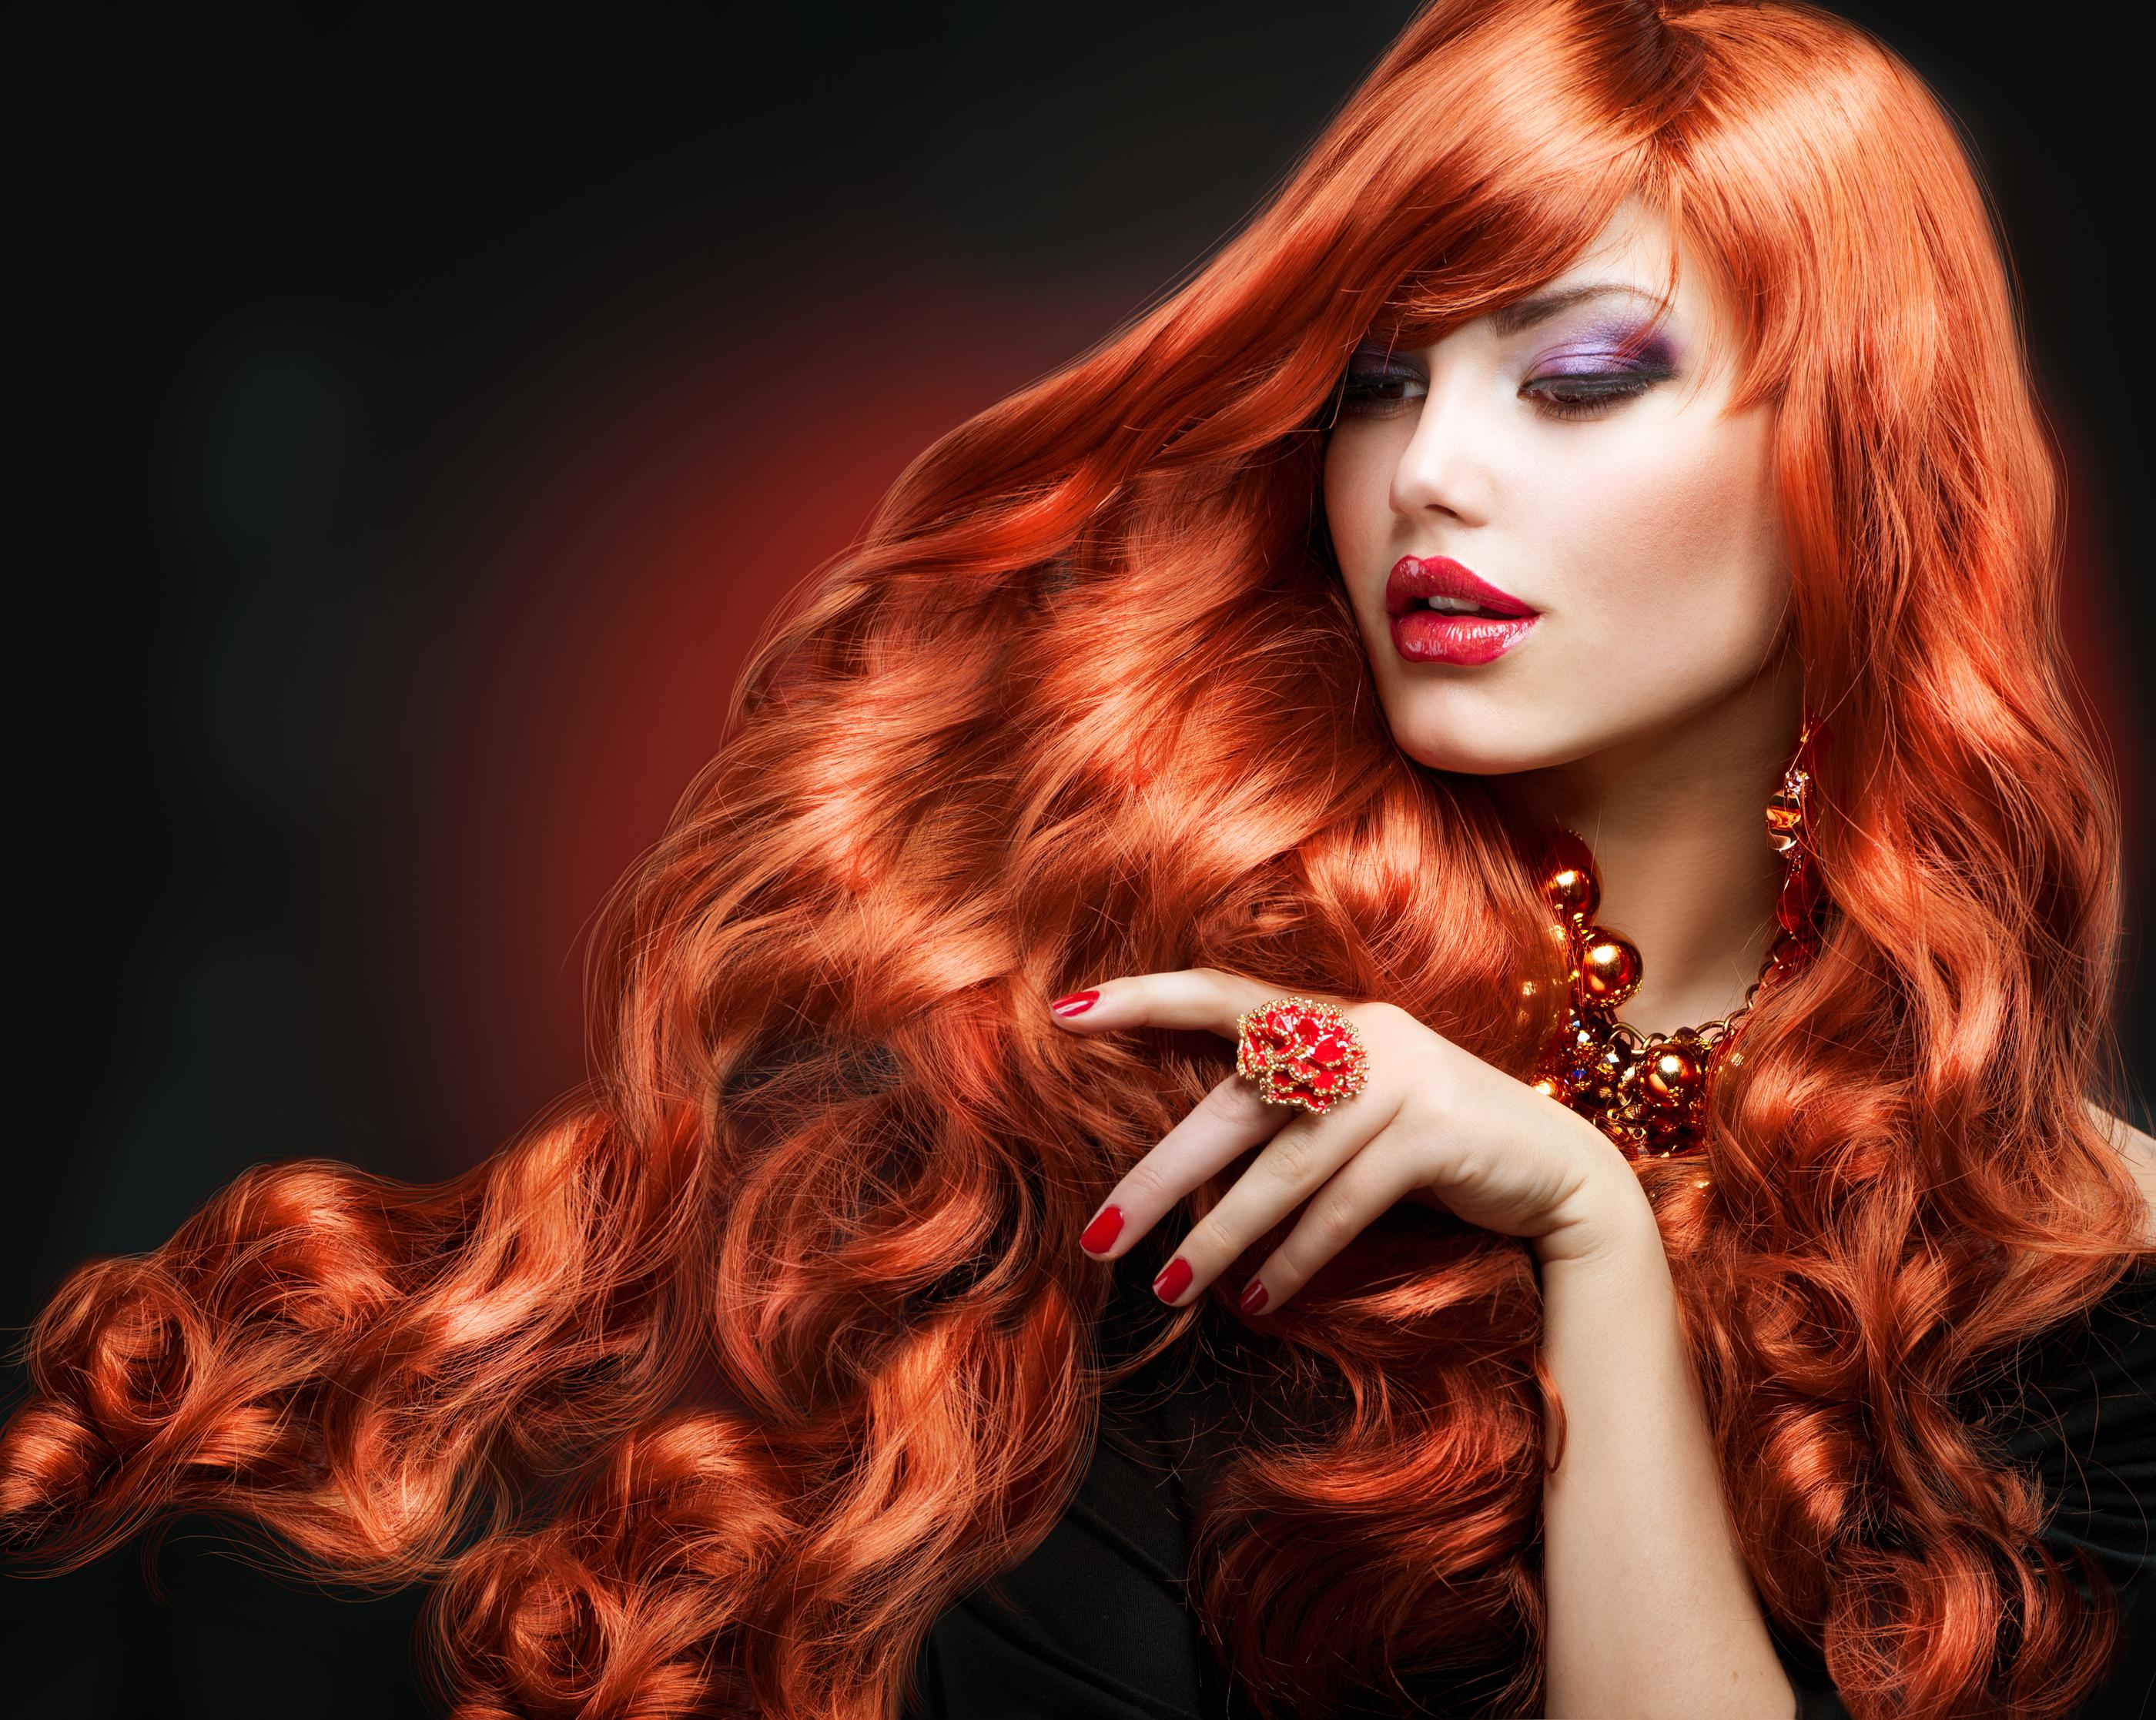 Hair HD Wallpaper